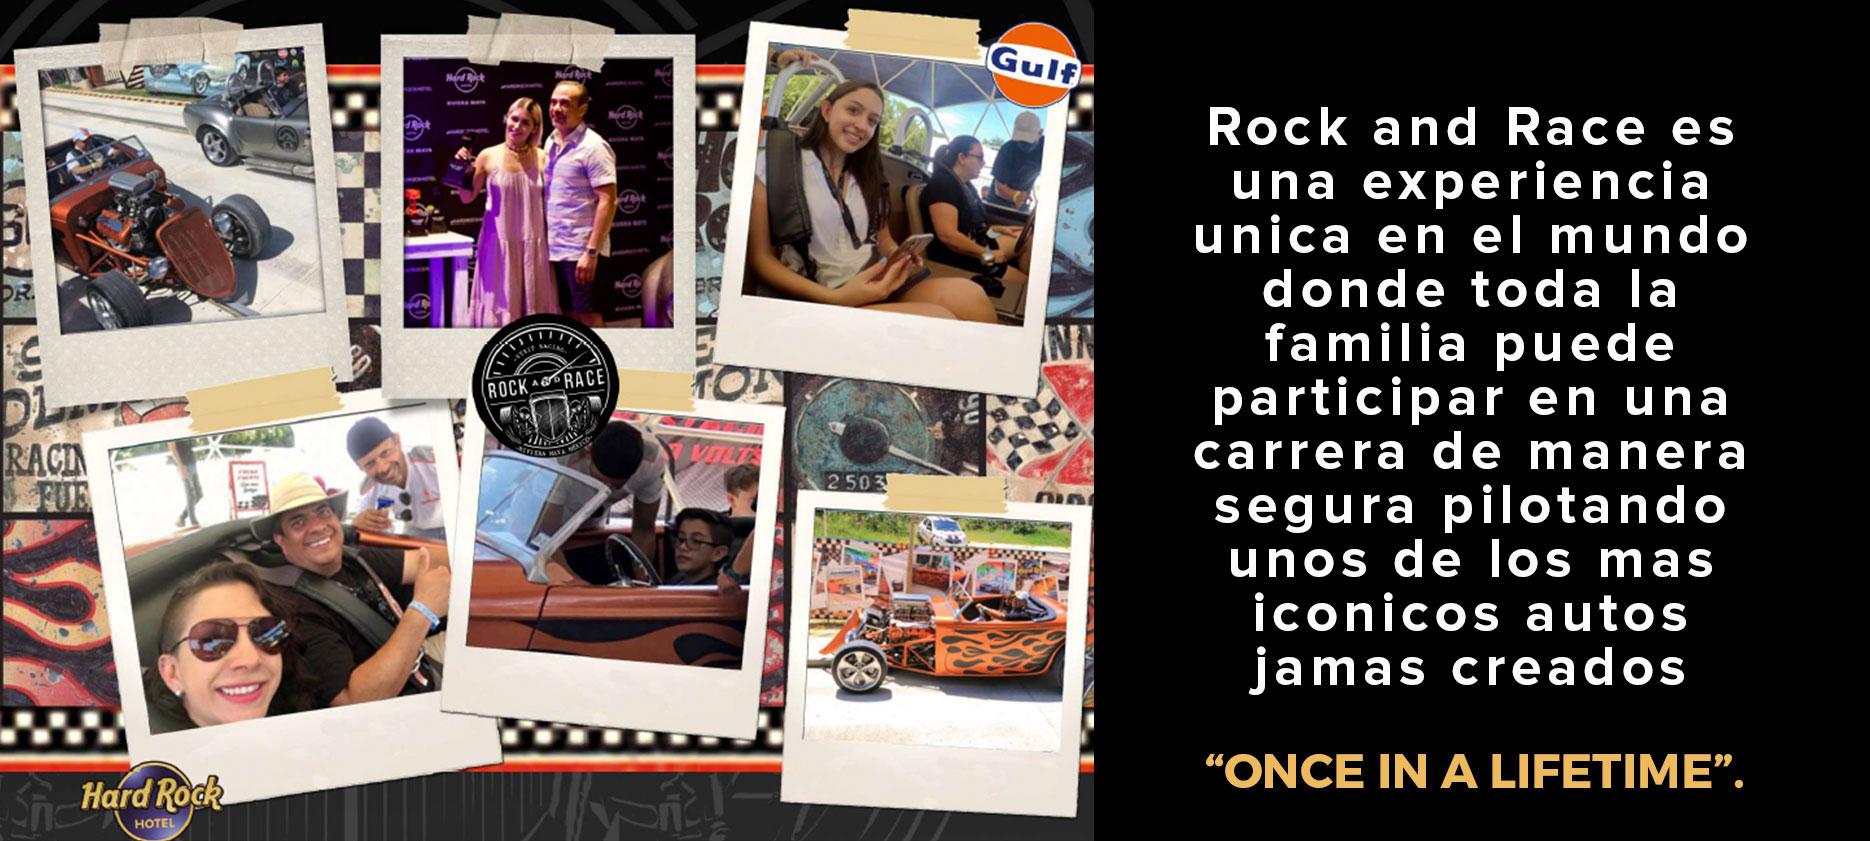 evento-rock-and-race-septiembre